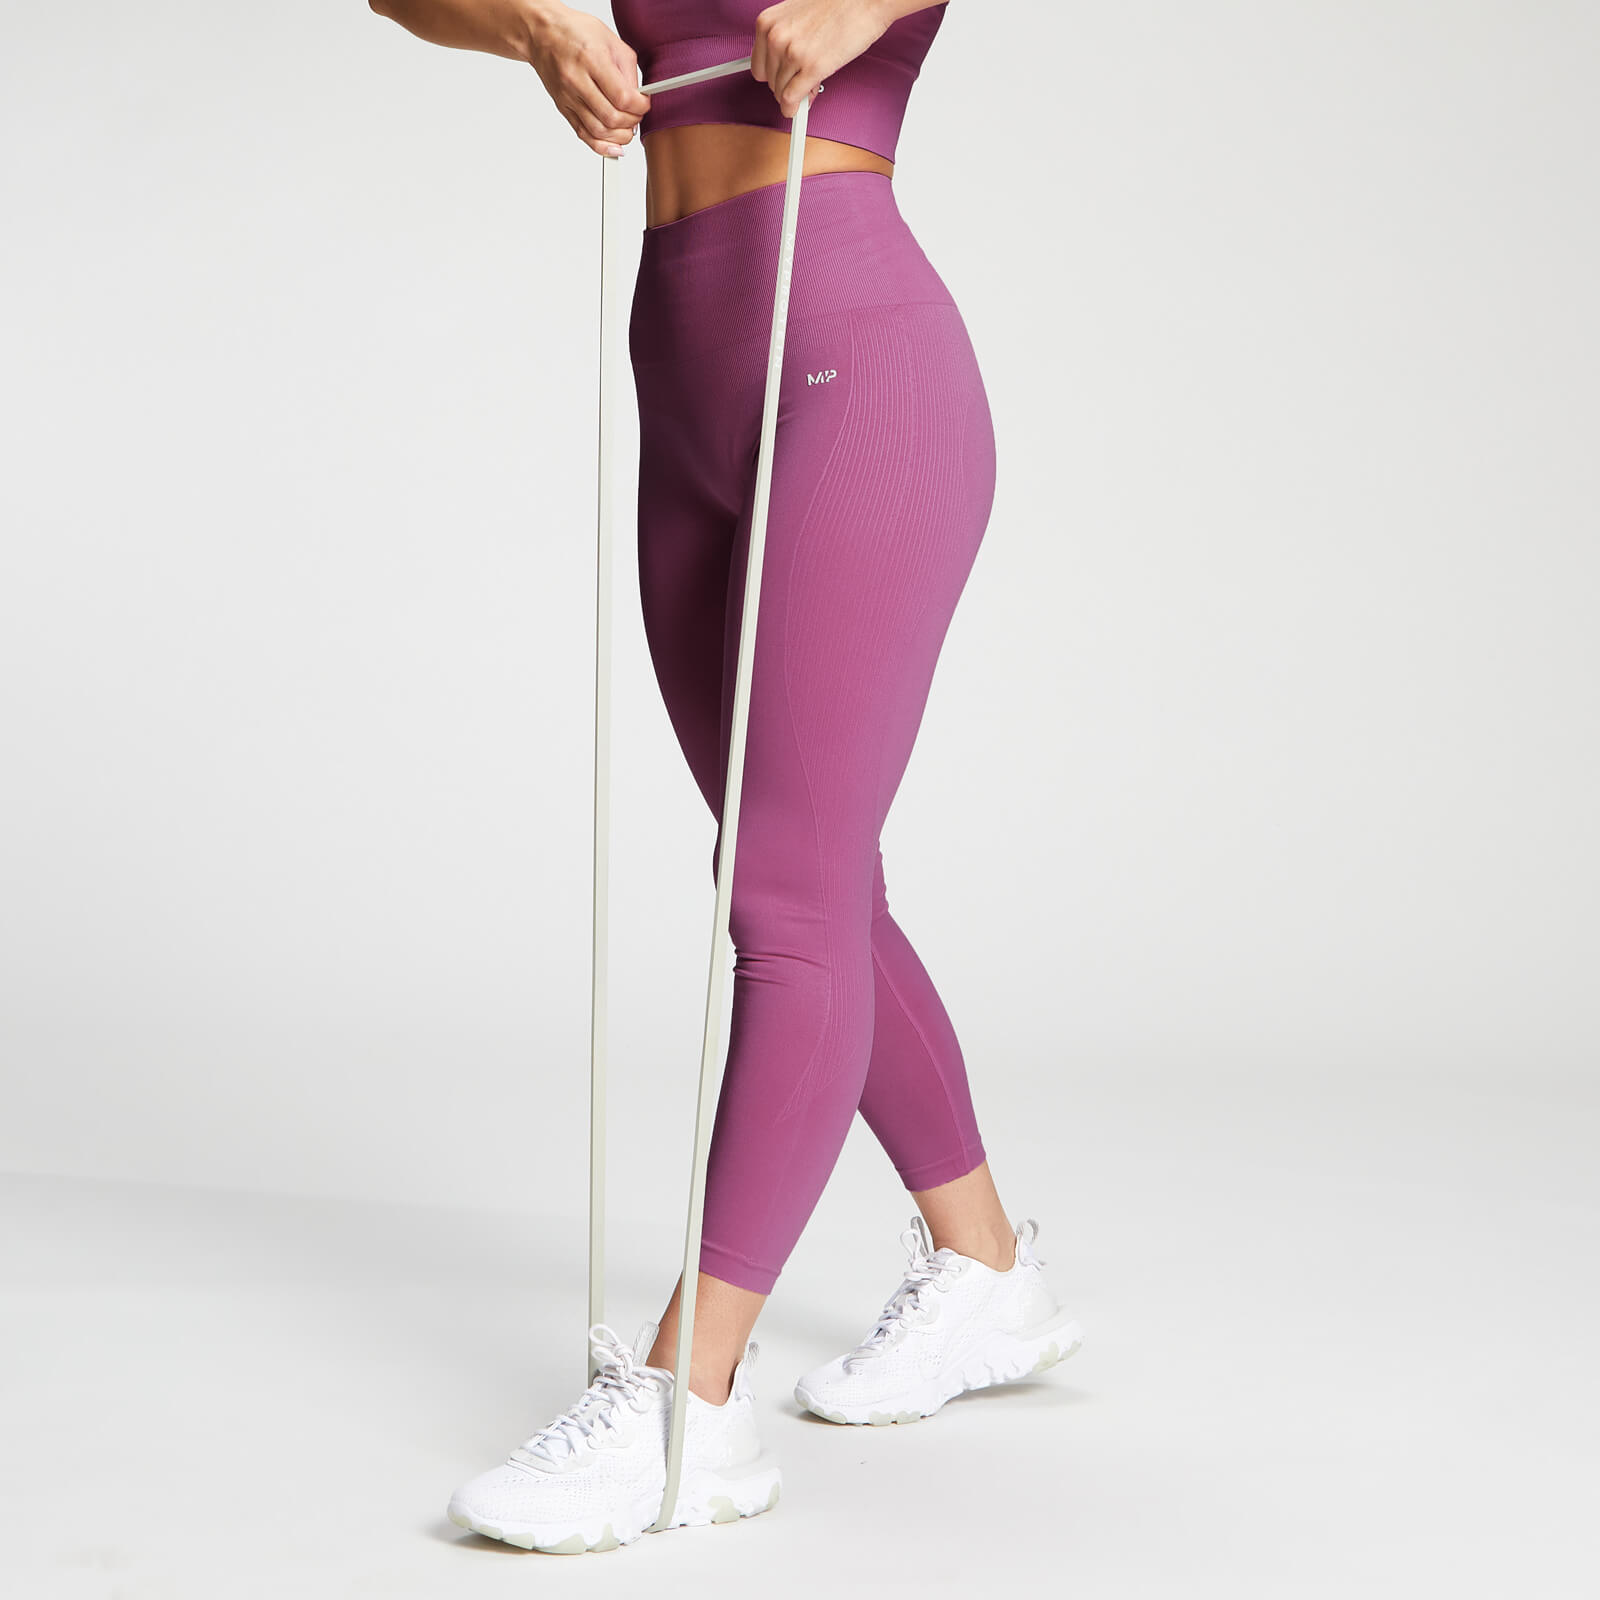 MP Women's Shape Seamless Ultra 7/8 Leggings - Orchid - XXS, Myprotein International  - купить со скидкой